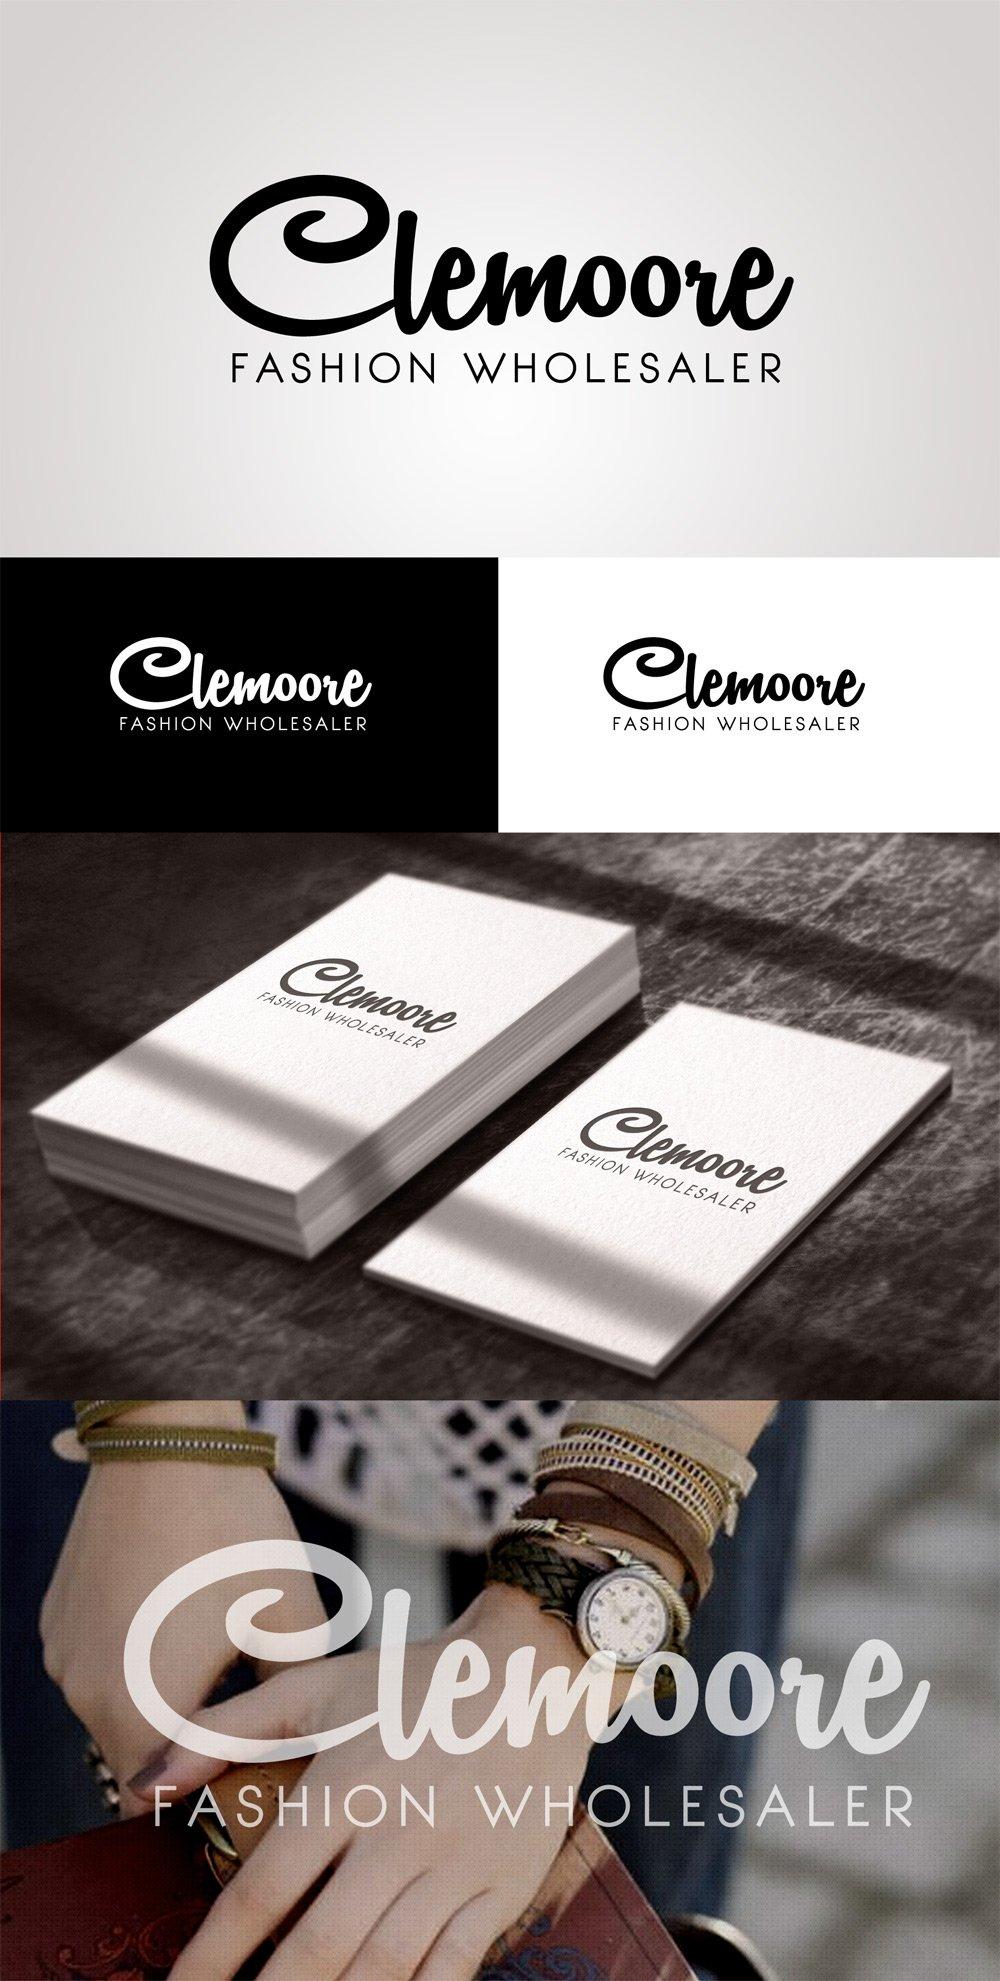 logo_clemoore